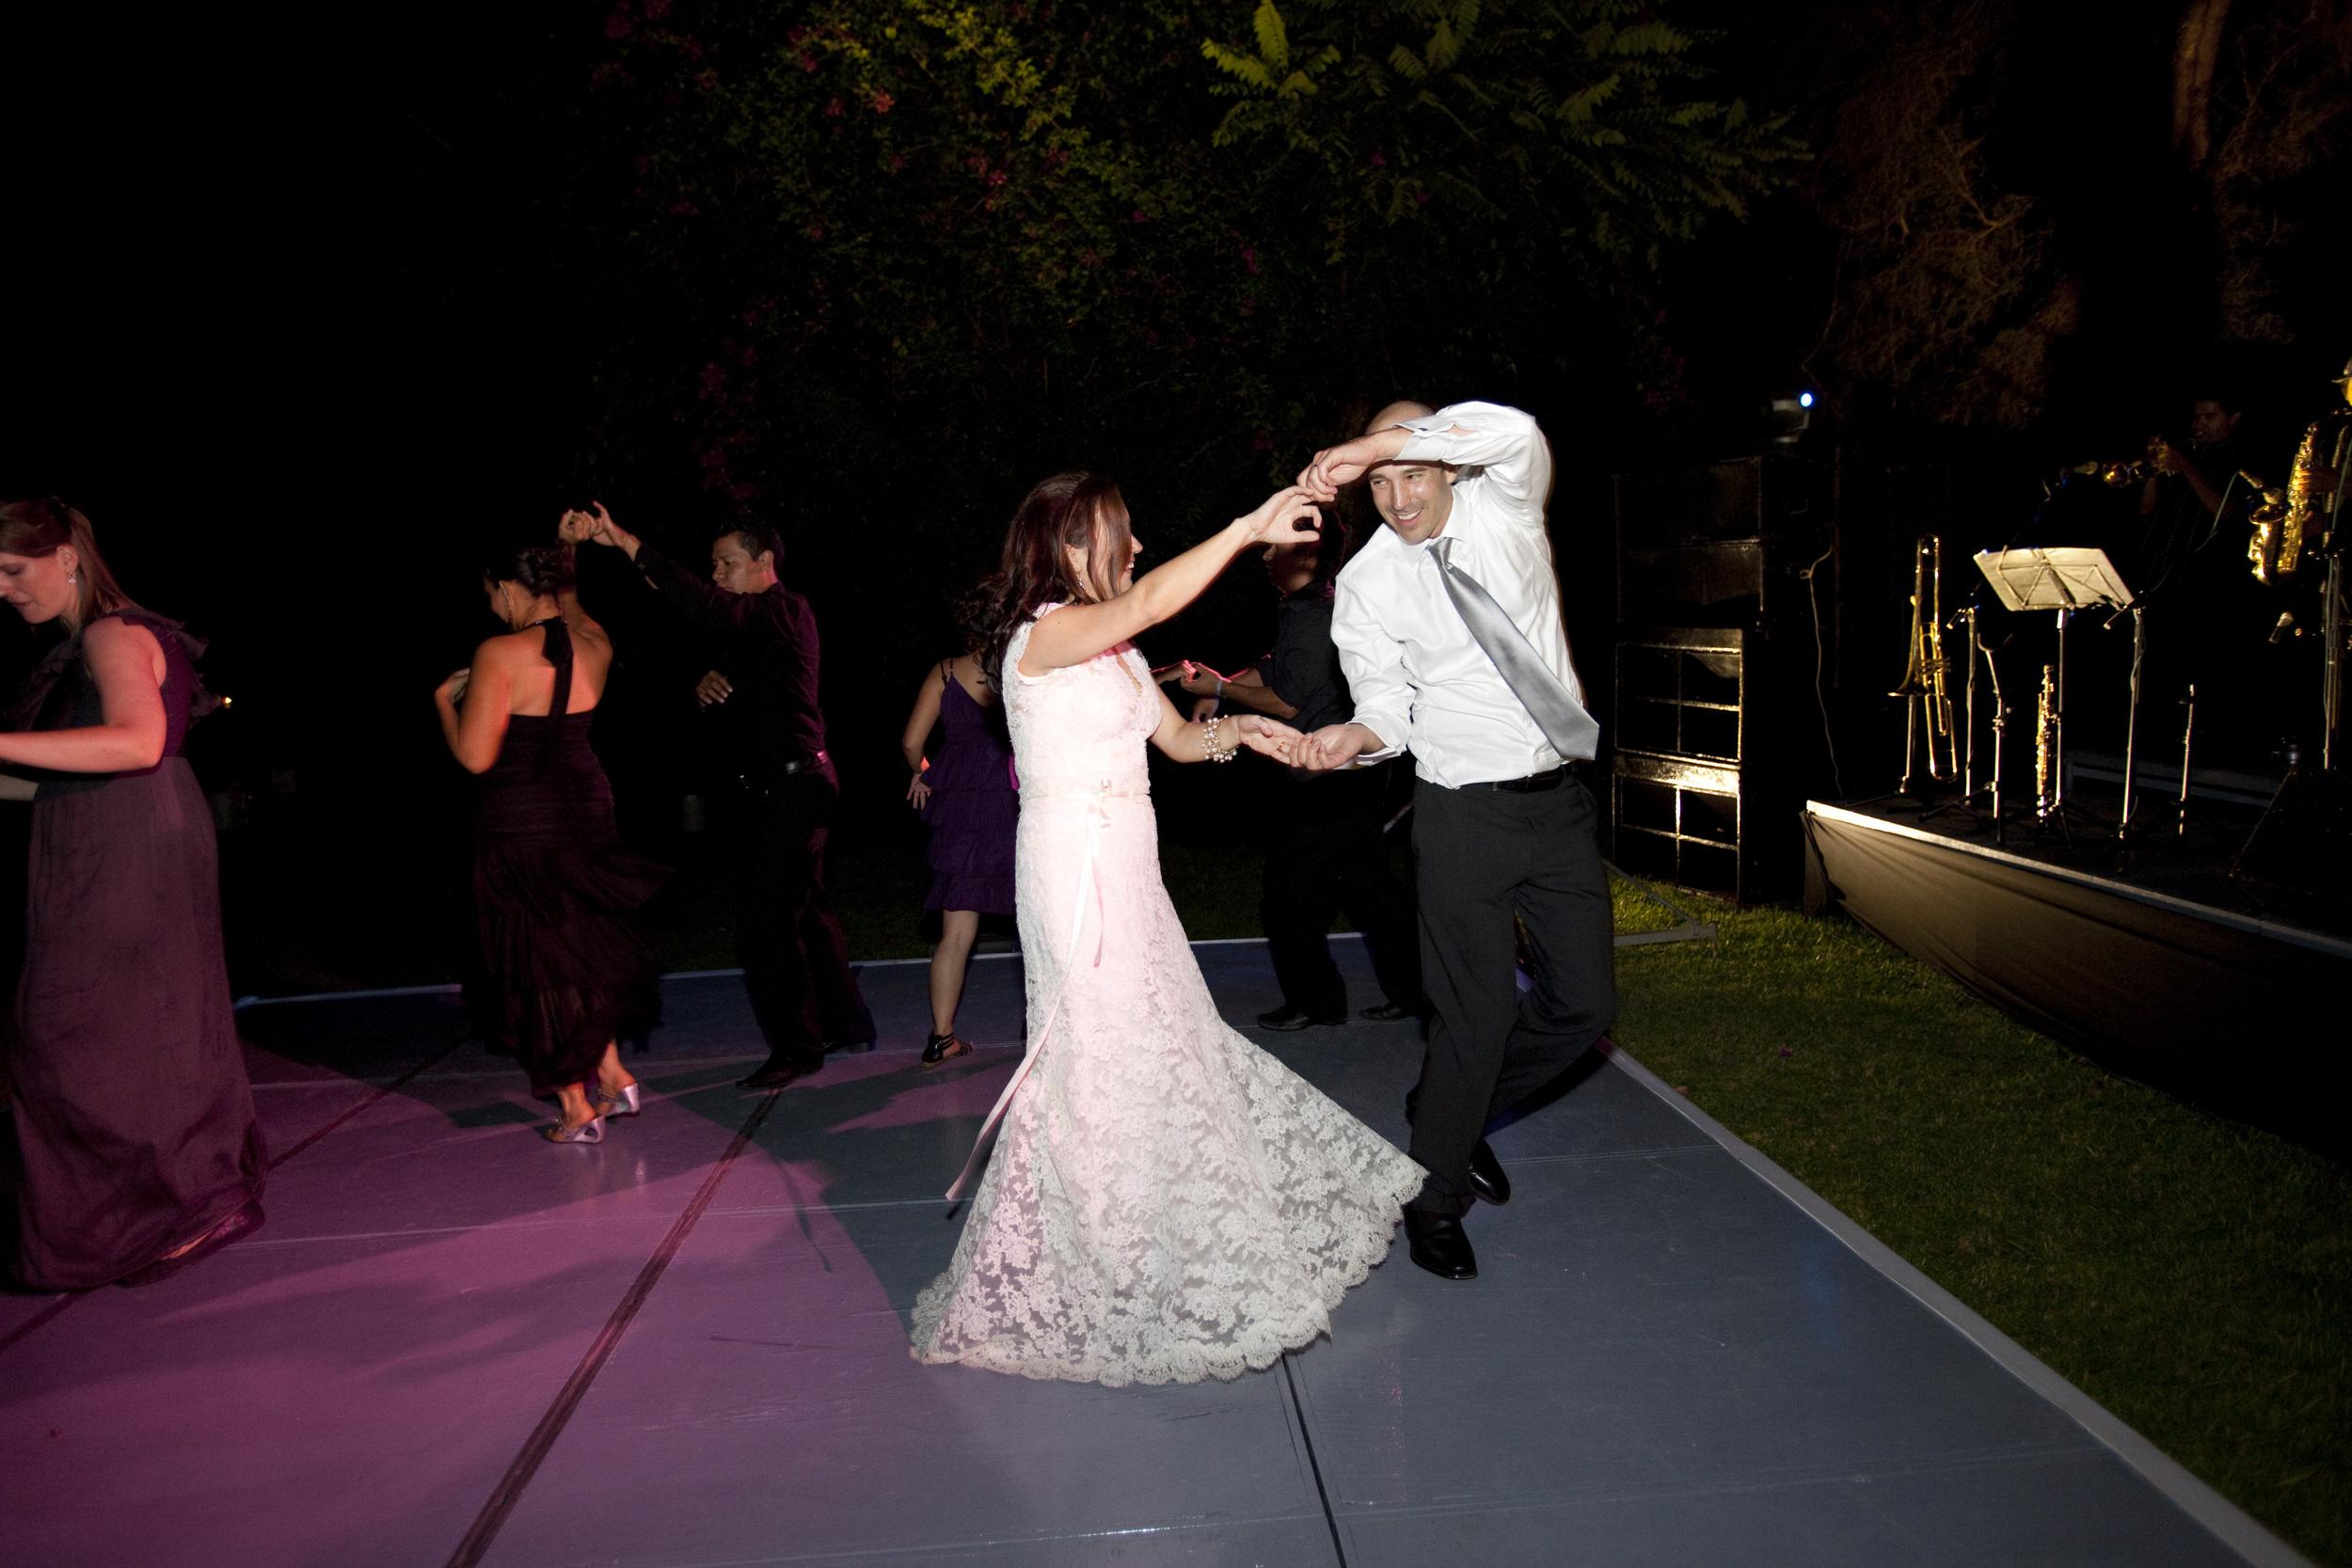 Ceci_New_York_Style_Luxury_Custom_Mexico_Wedding_CeciBride_Letterpress_NewYork_Foil_Hacienda_de_San_Antonio_55.jpg